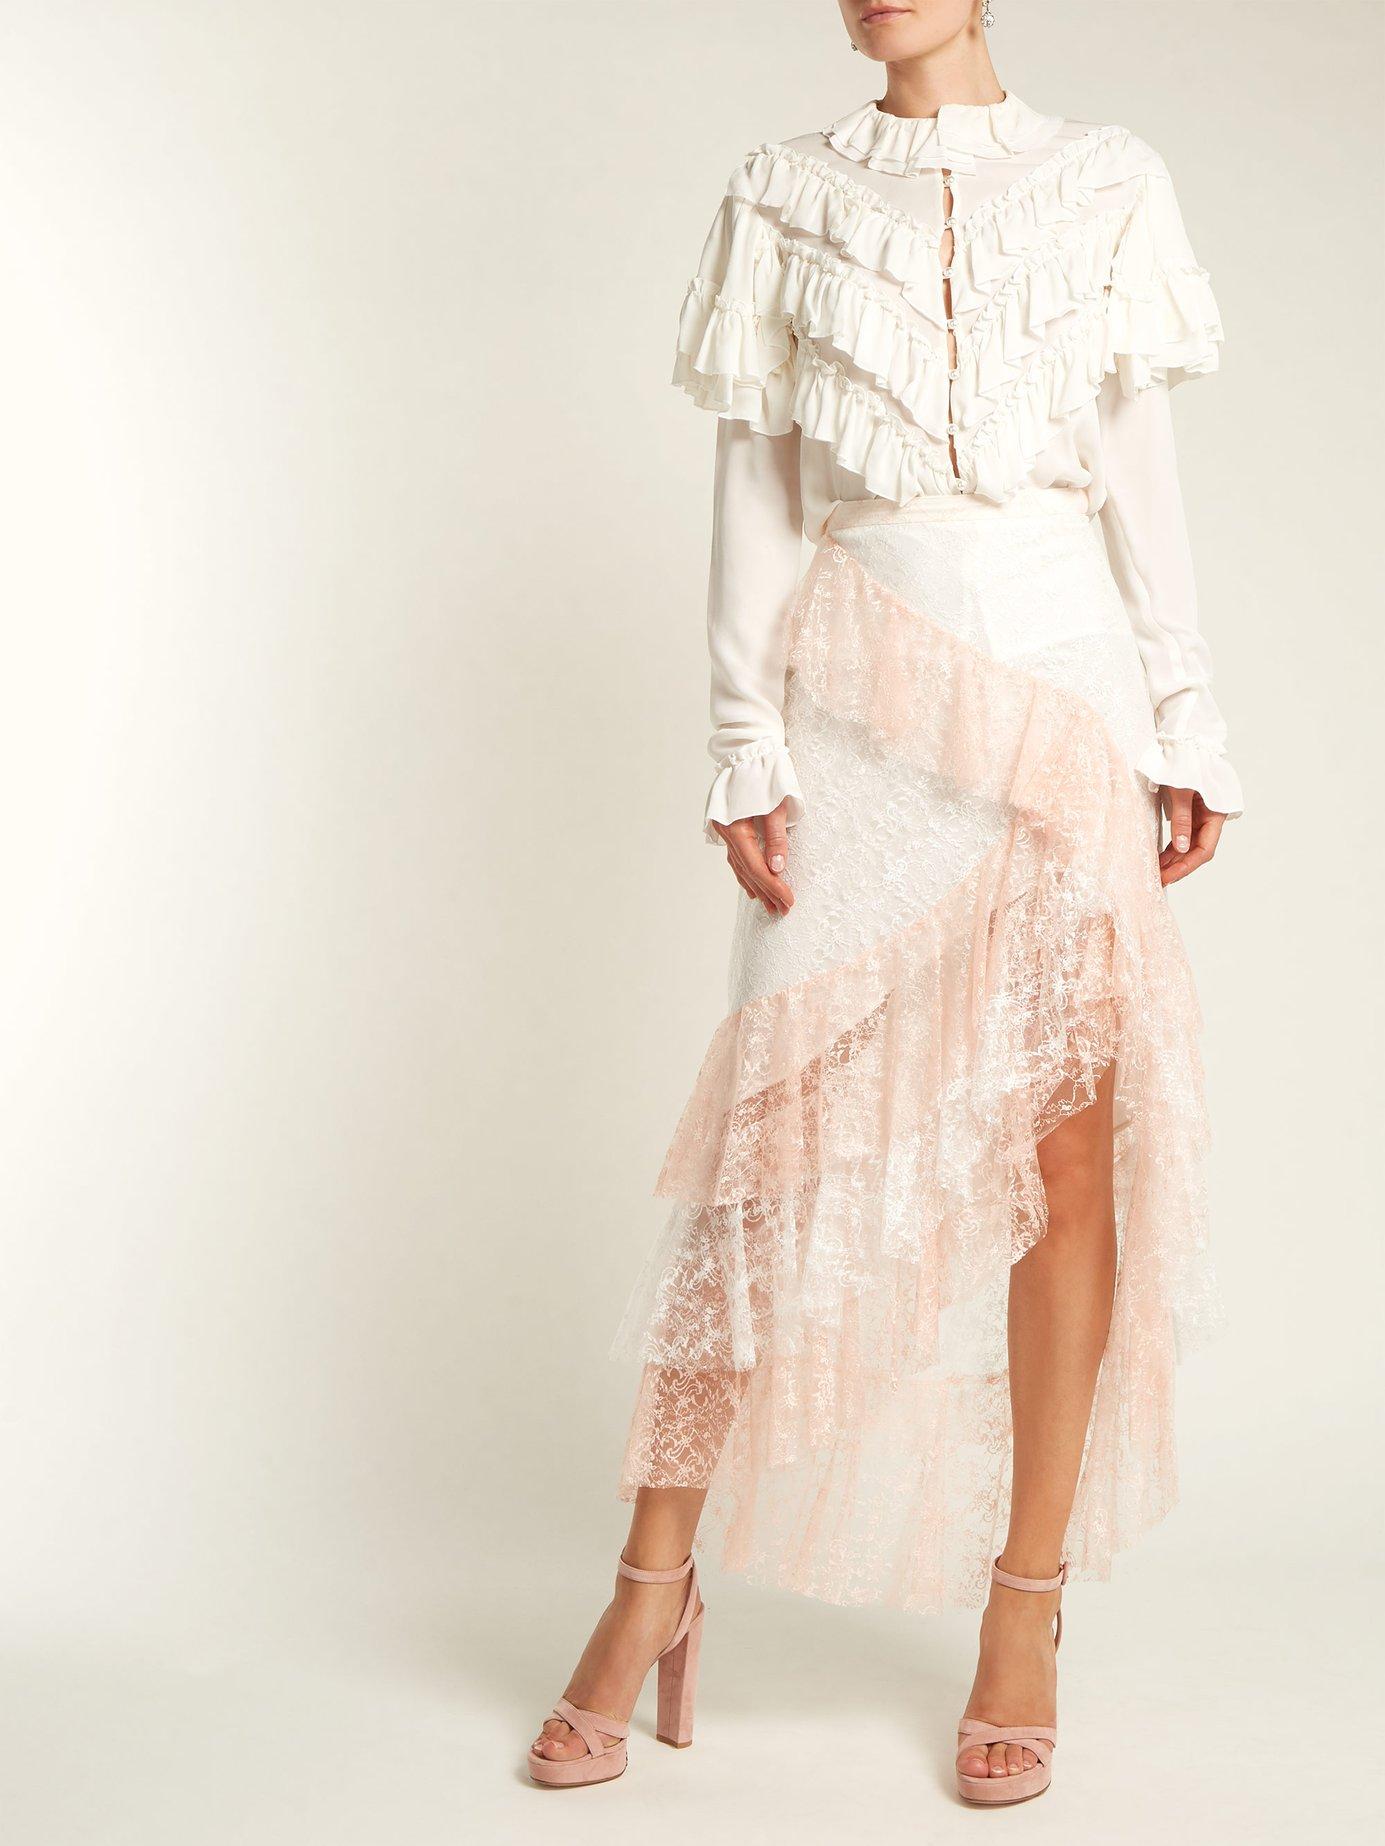 Ruffled silk blouse by Rodarte